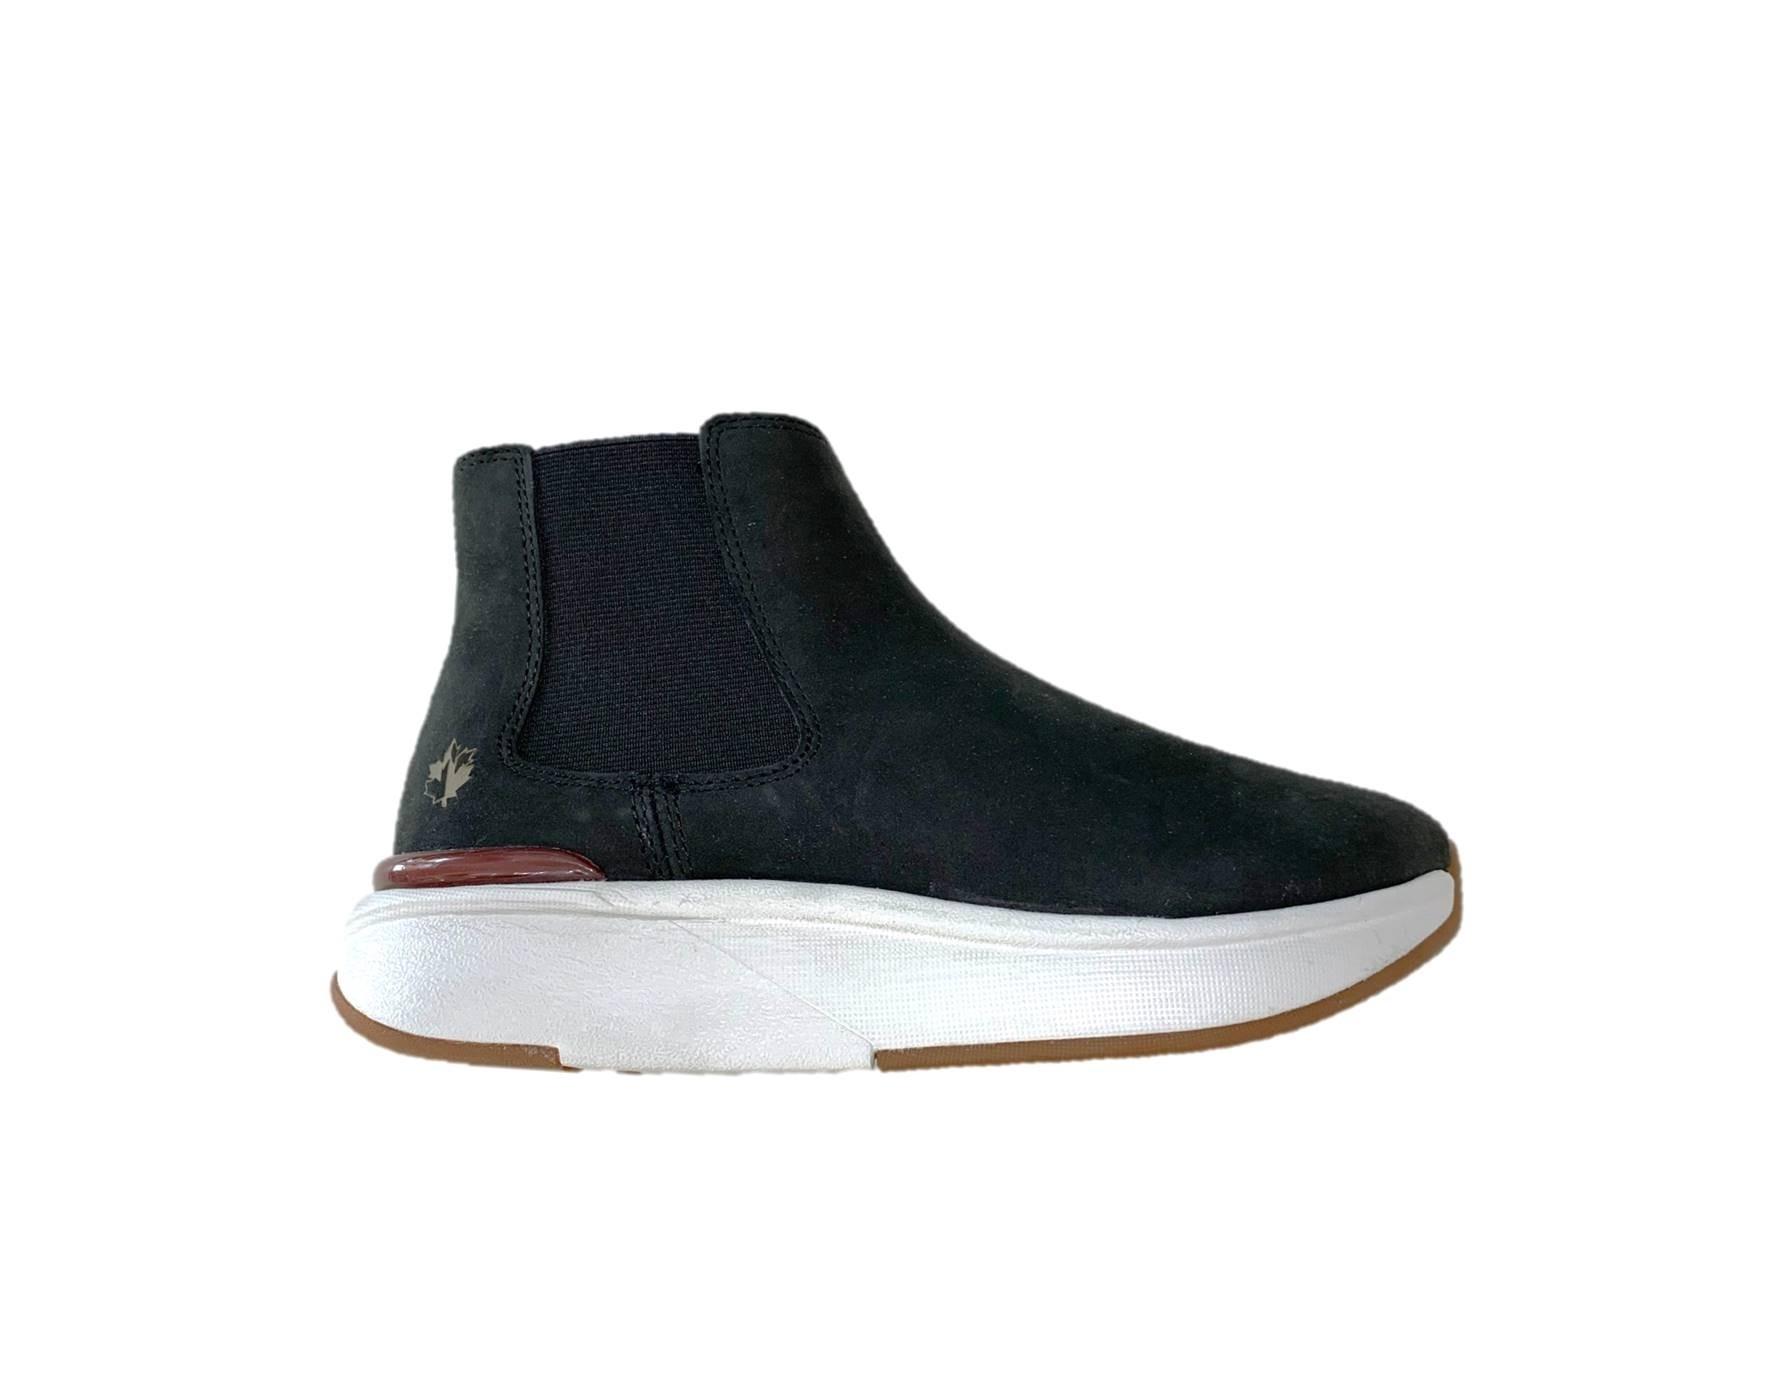 promo code 59193 0eb41 LUMBERJACK MERYL SW66413 sneakers alte stivaletto slip on scarpe in pelle  donna